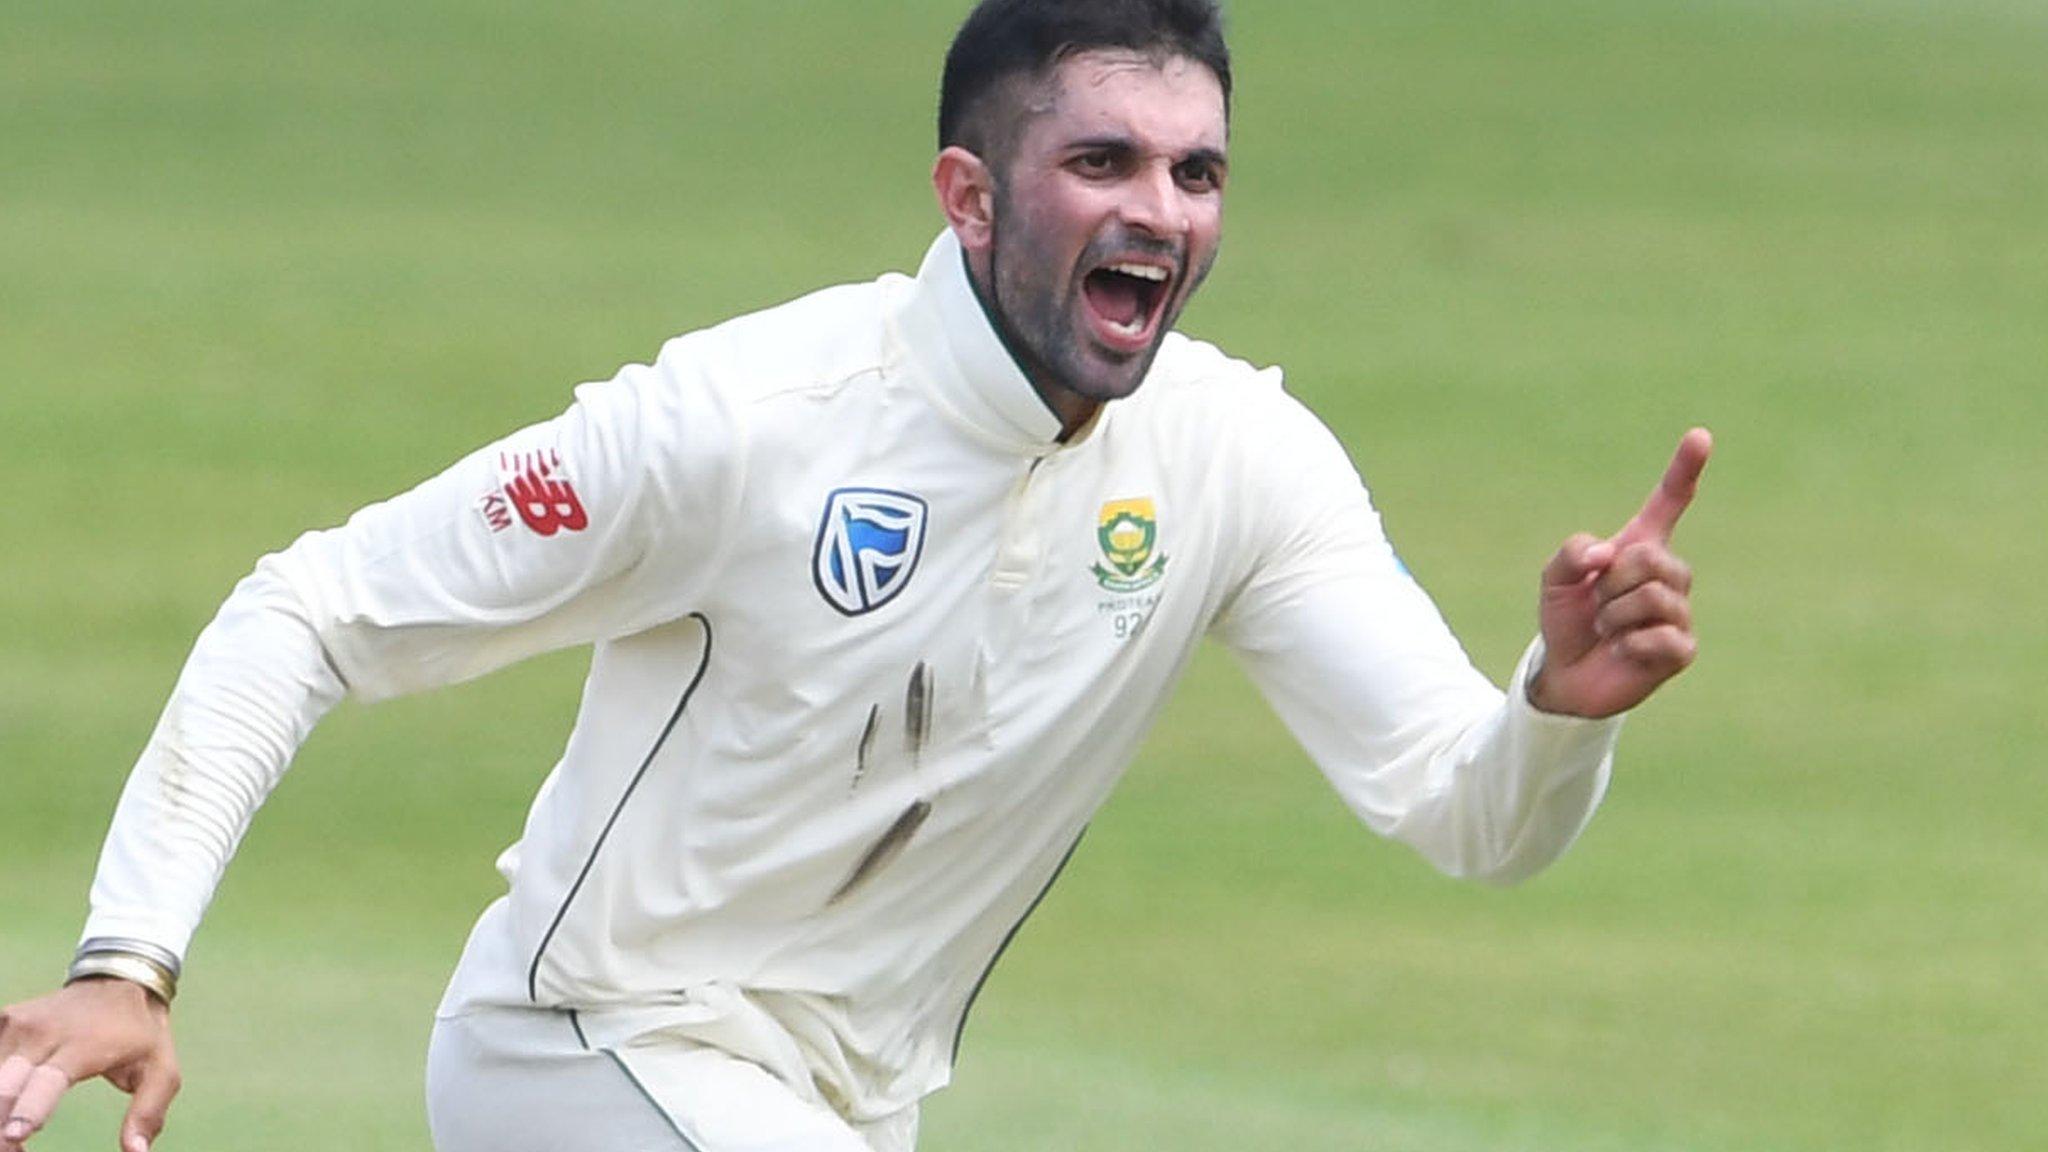 Keshav Maharaj: Yorkshire sign South Africa spinner for three games